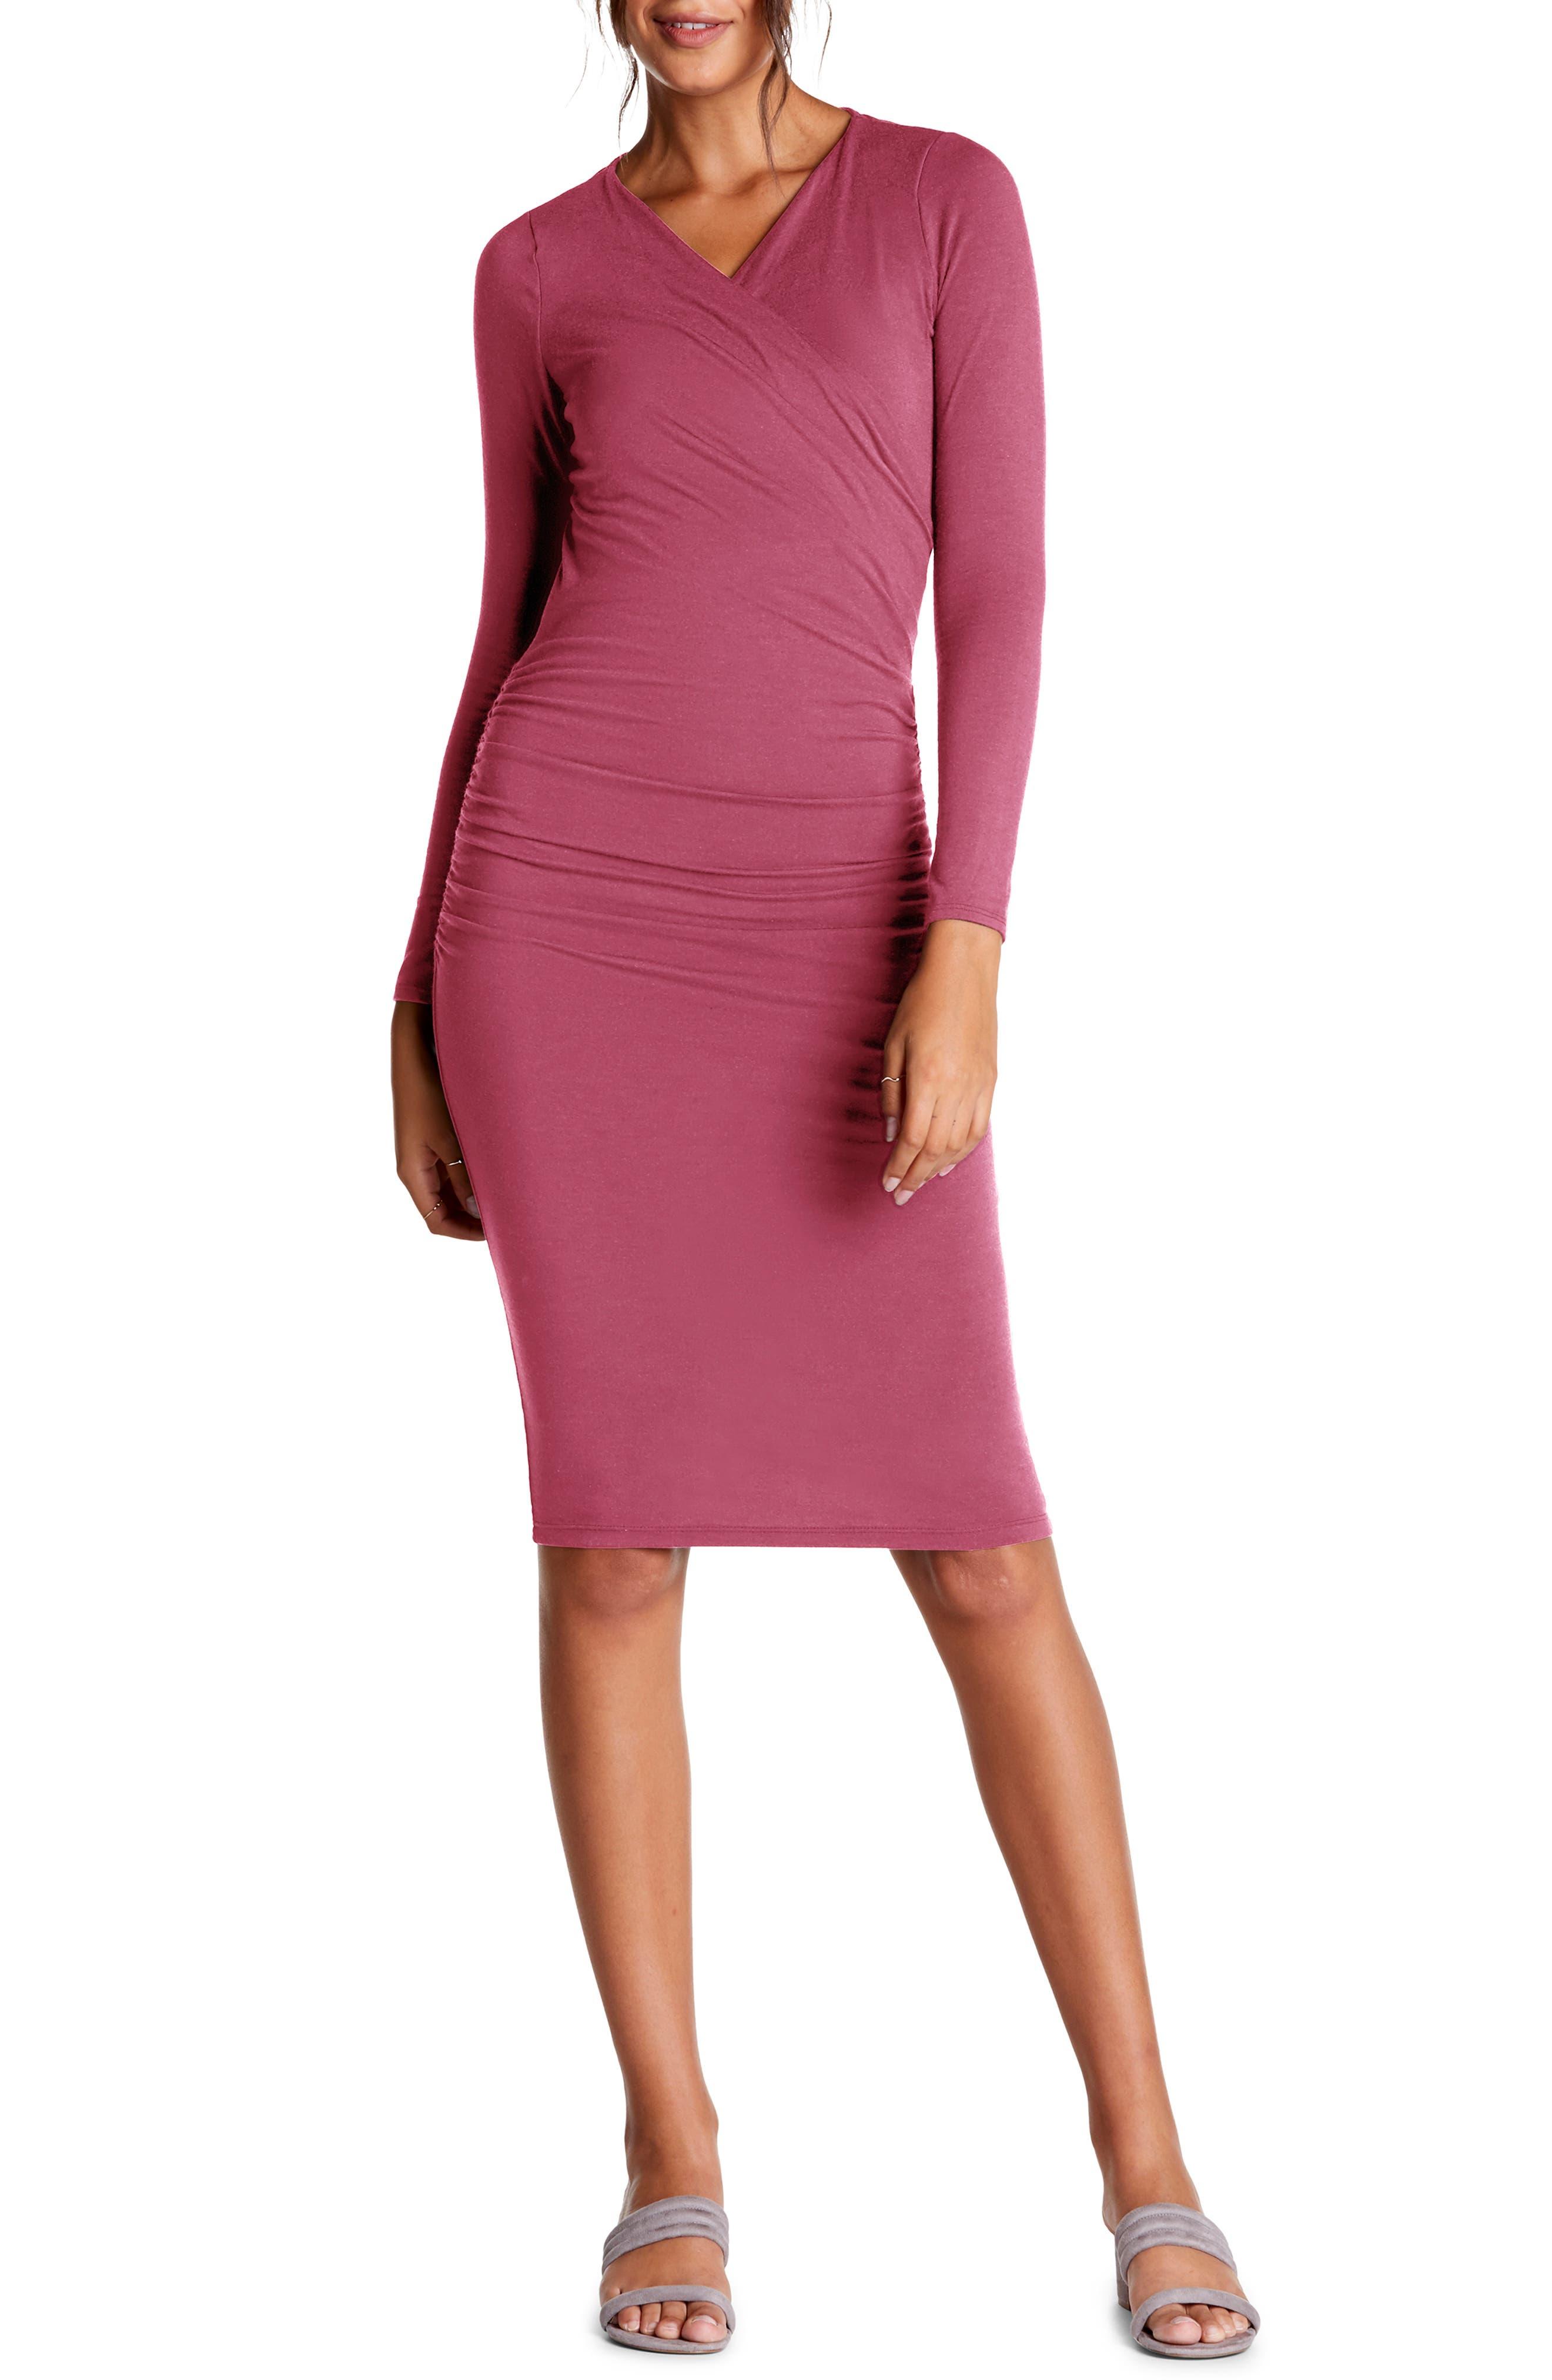 Michael Stars Mikaela Crossover Knit Dress, Pink